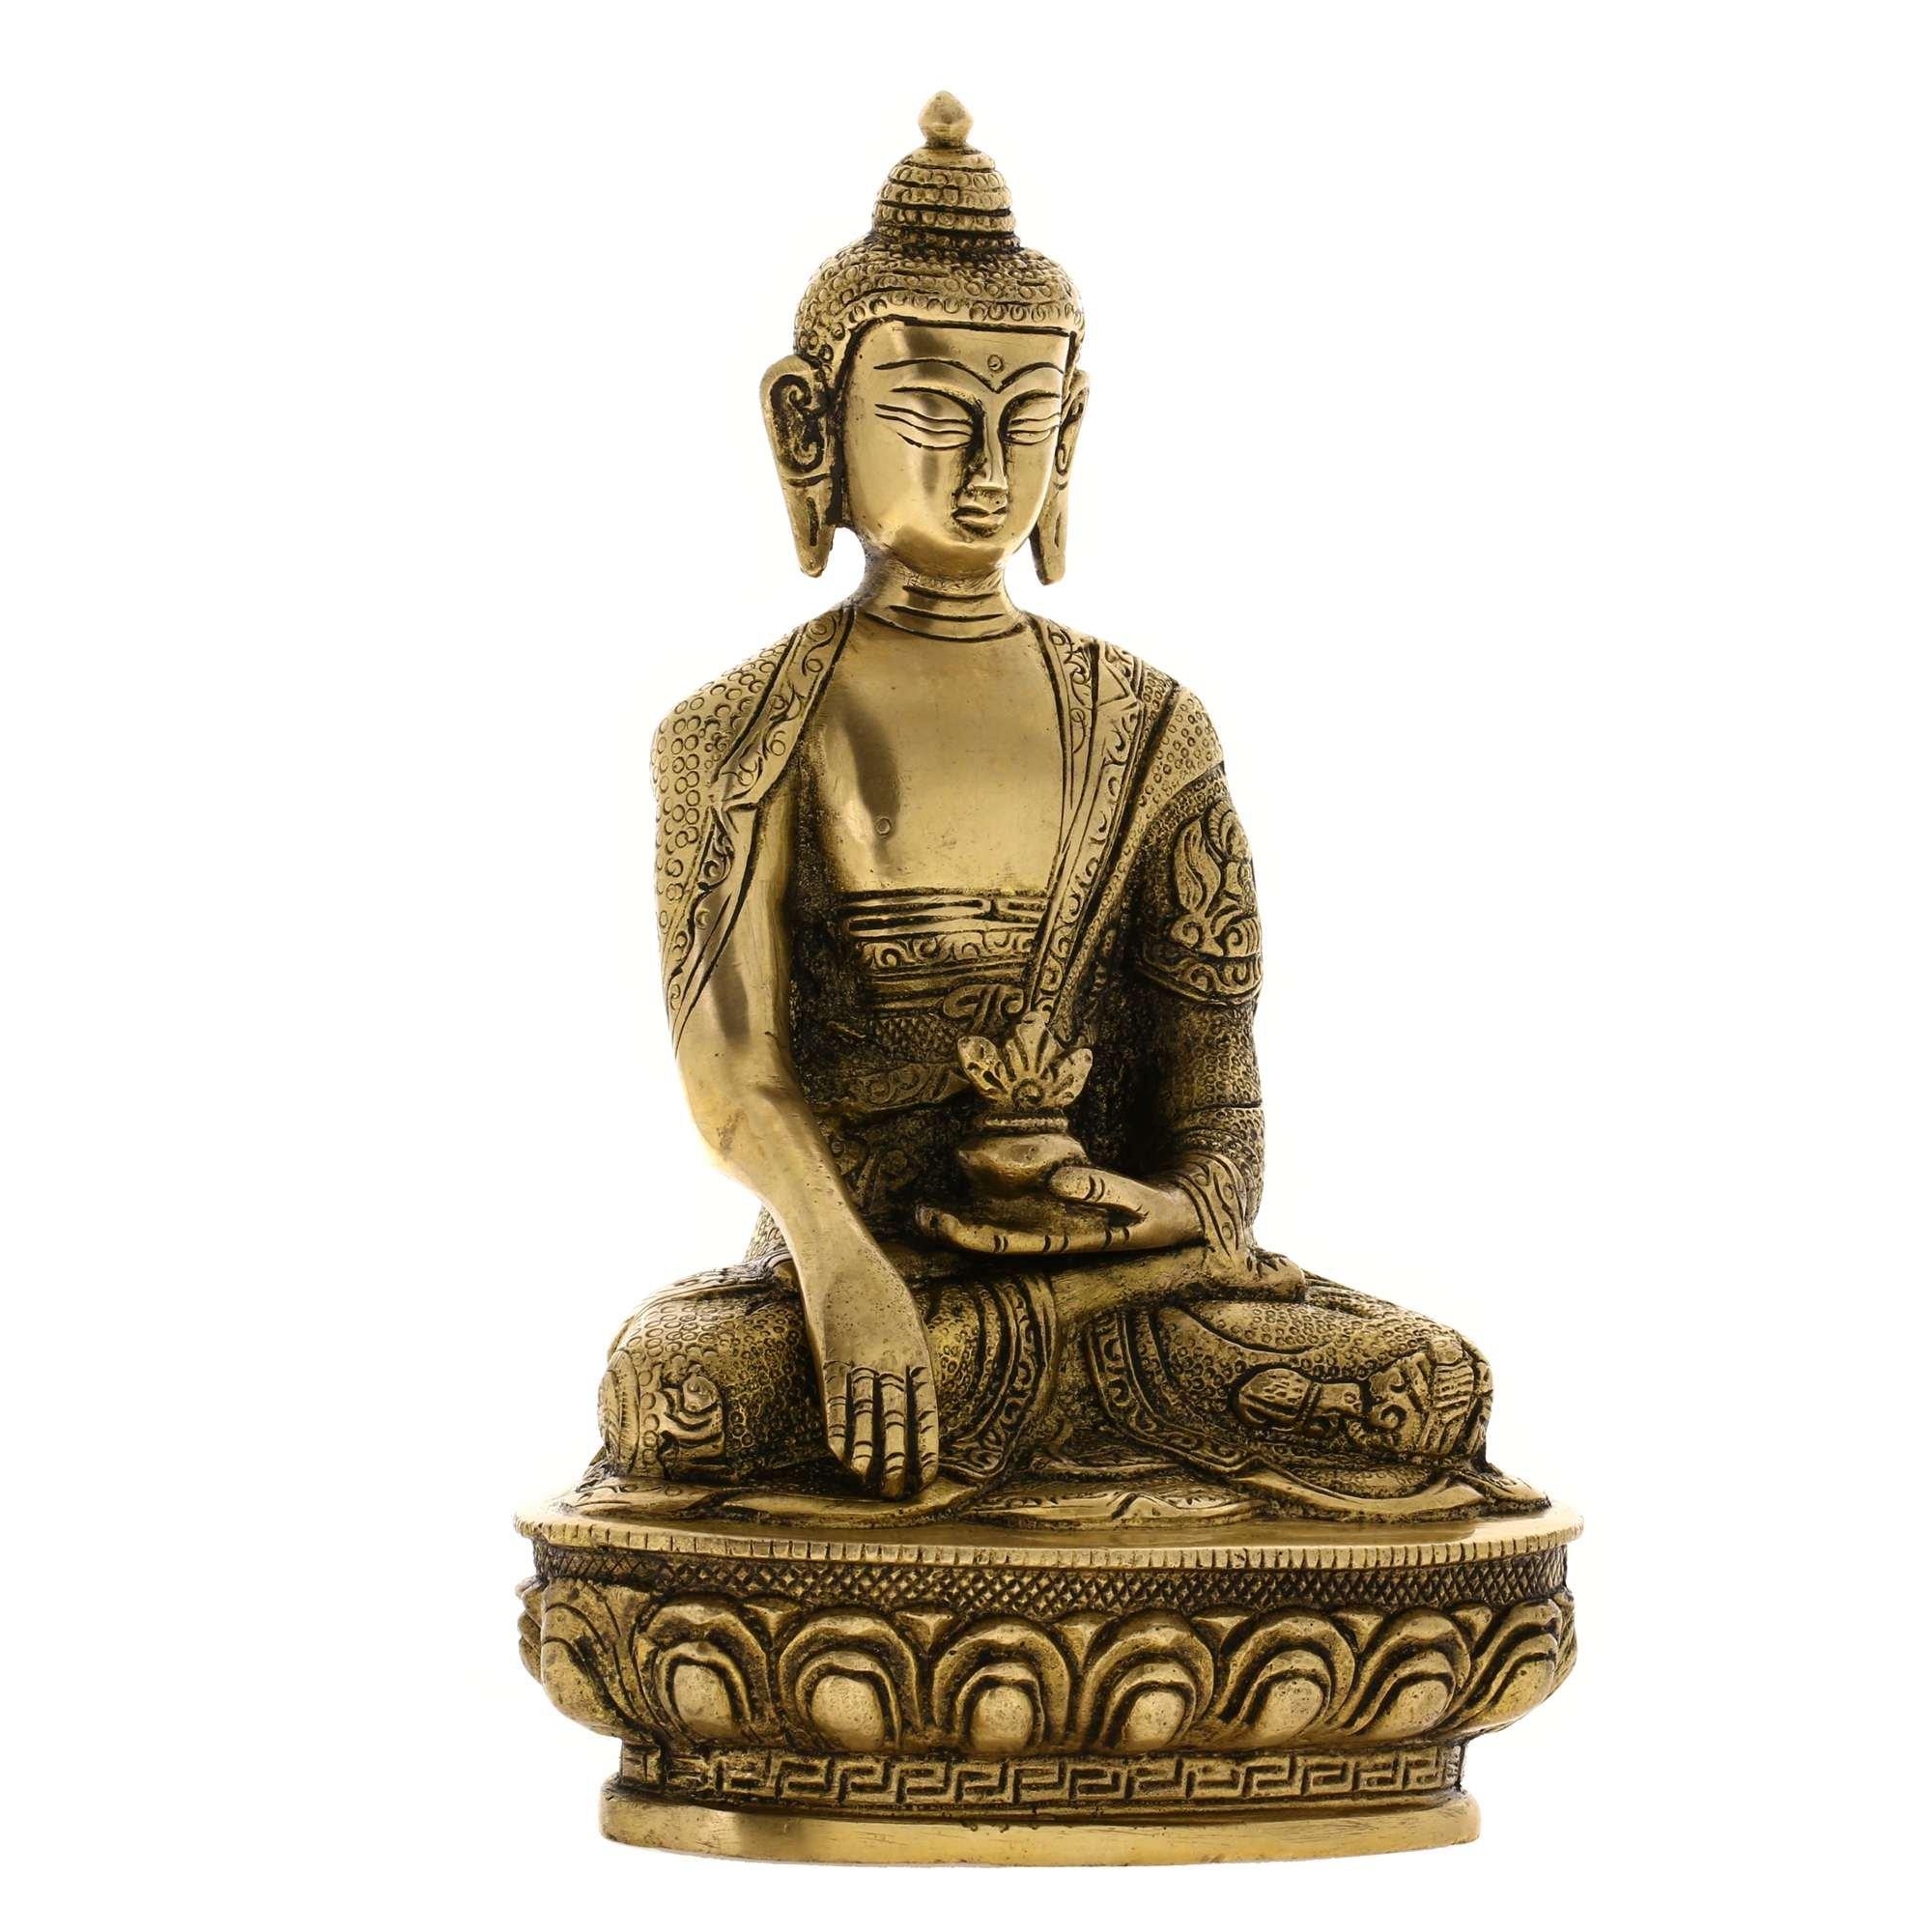 Handmade Seated Buddha Statue Sculpture India Metal Sculpture Spiritual Gifts by ShalinIndia (Image #3)